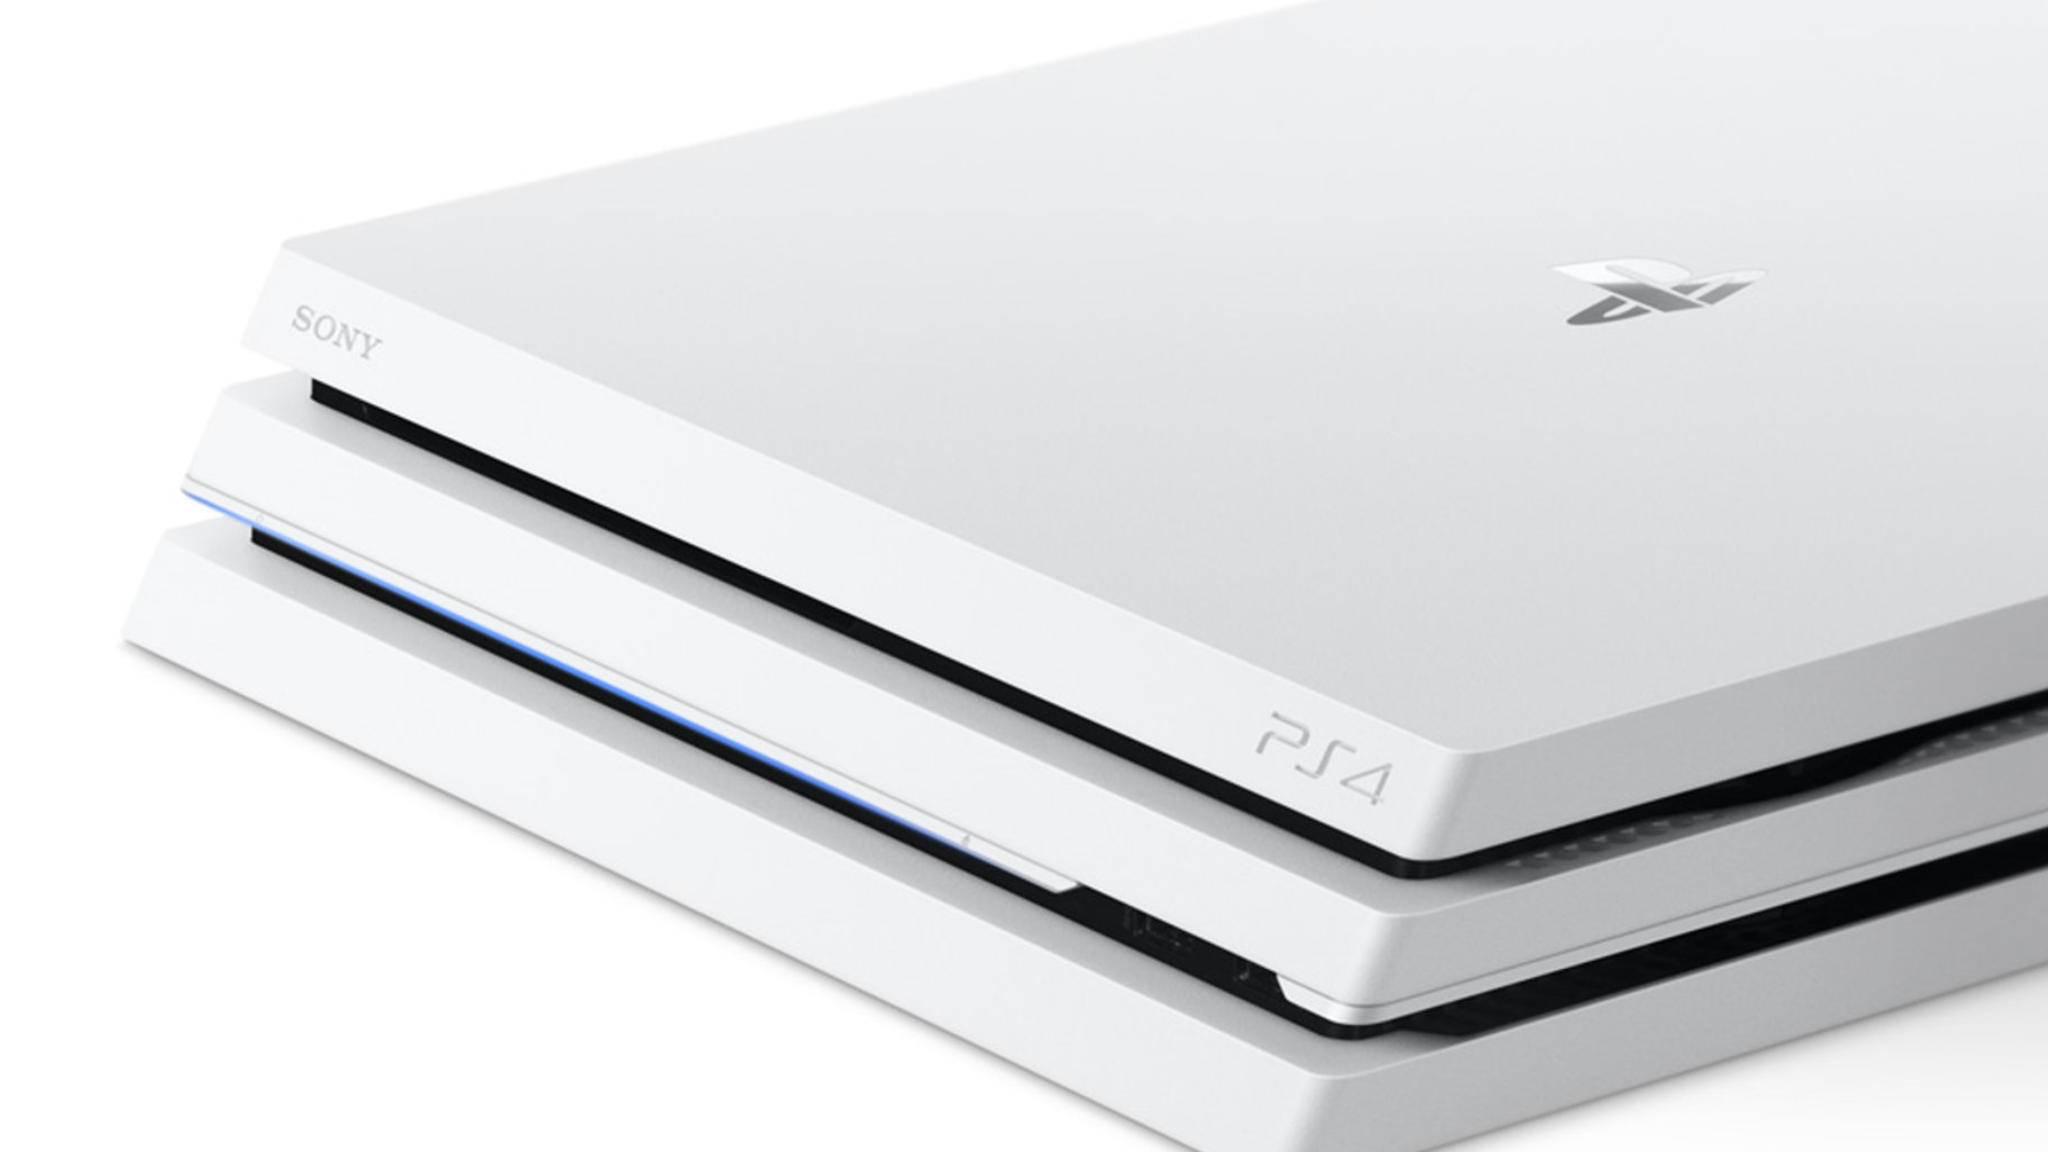 """Destiny 2"" sei Dank: Die PS4 Pro kommt in Weiß."